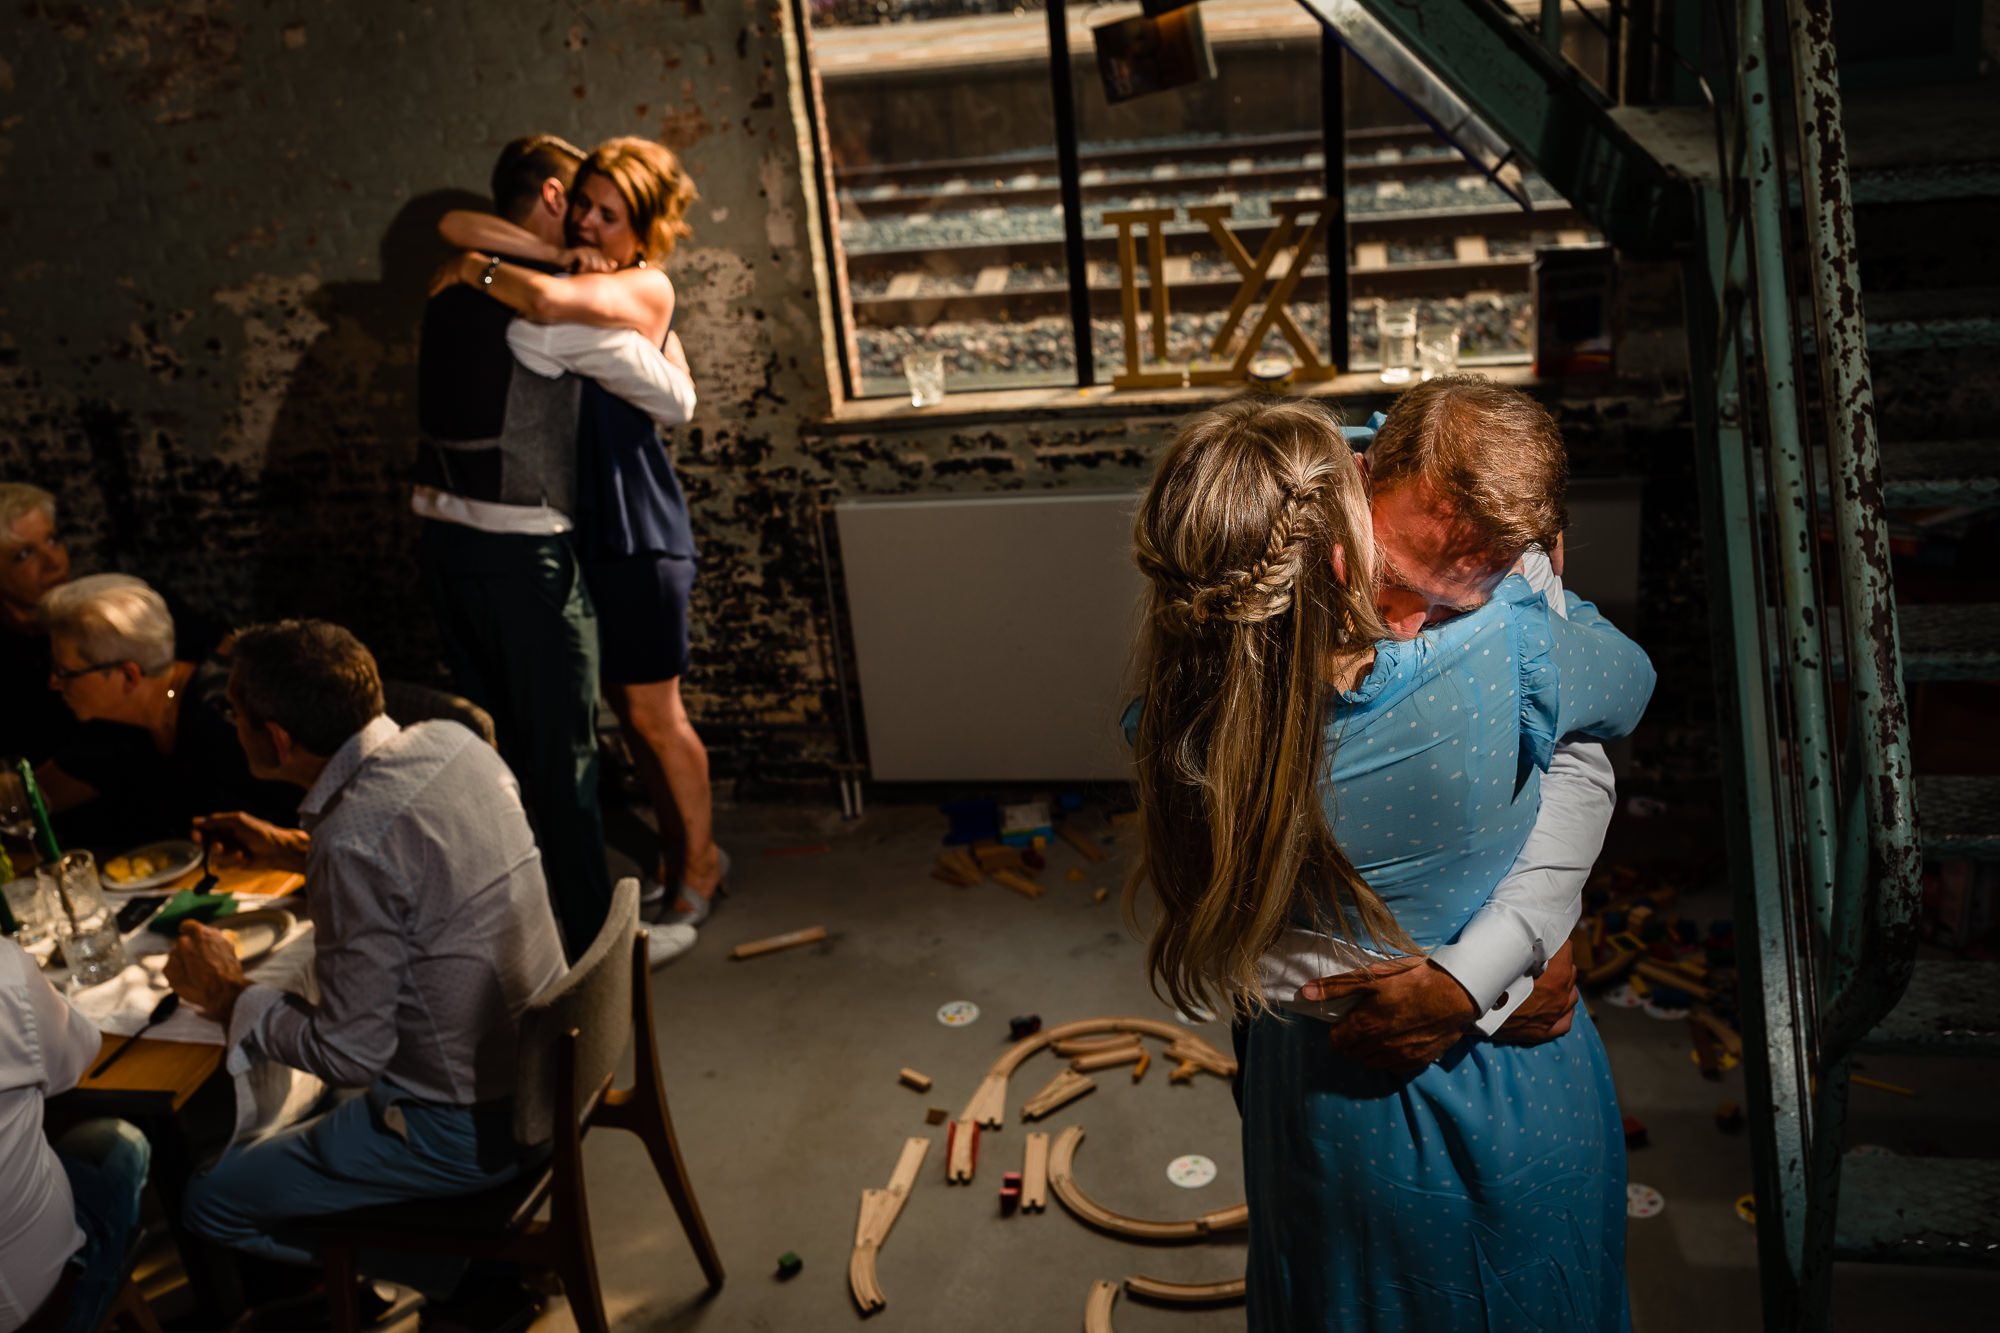 Bruidegommen knuffelen beiden tegelijk hun vriendinnen